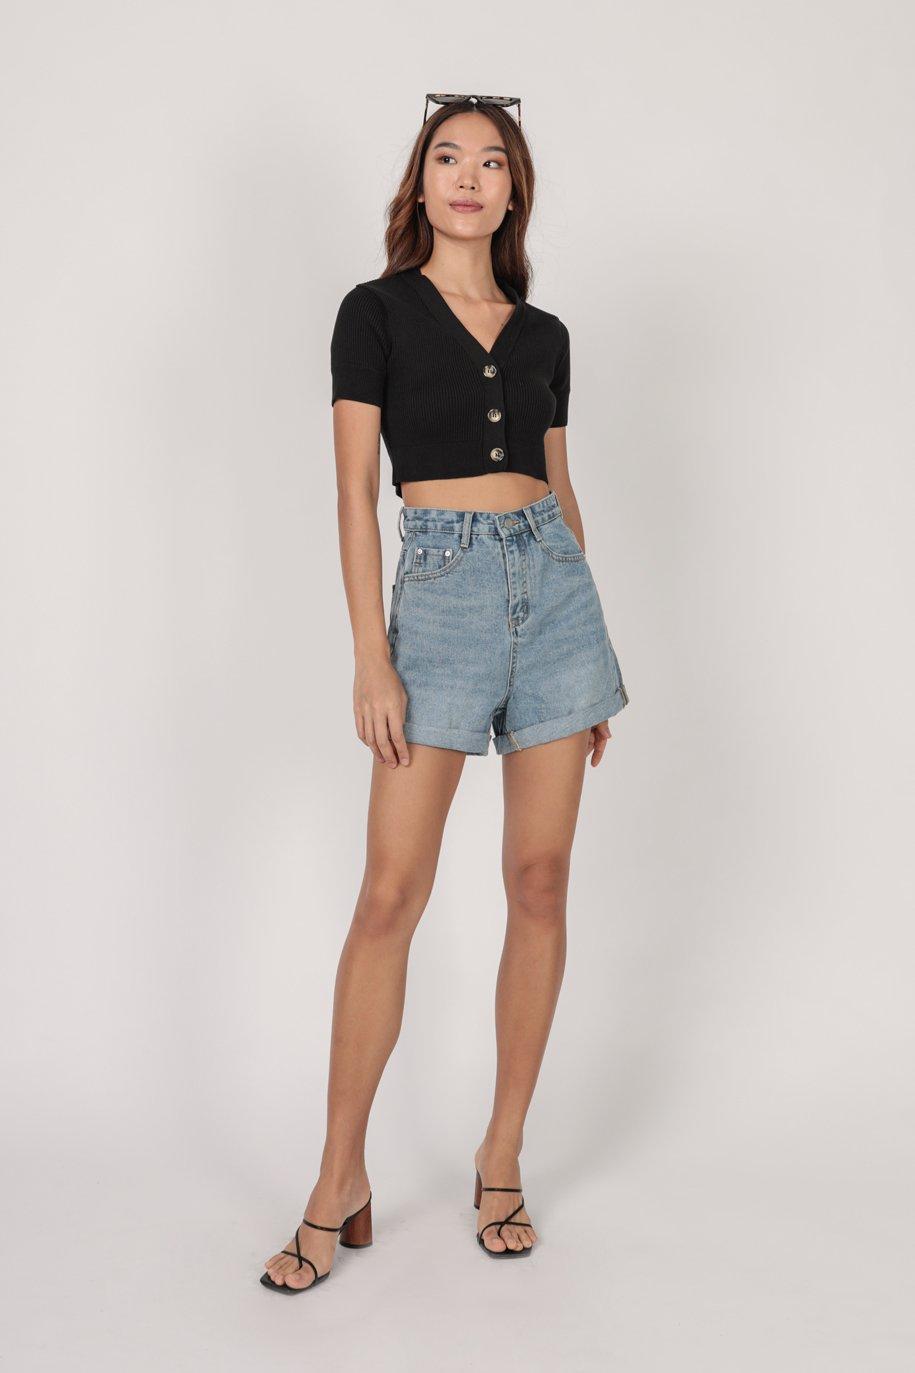 Marcie Button Knit Top (Black)